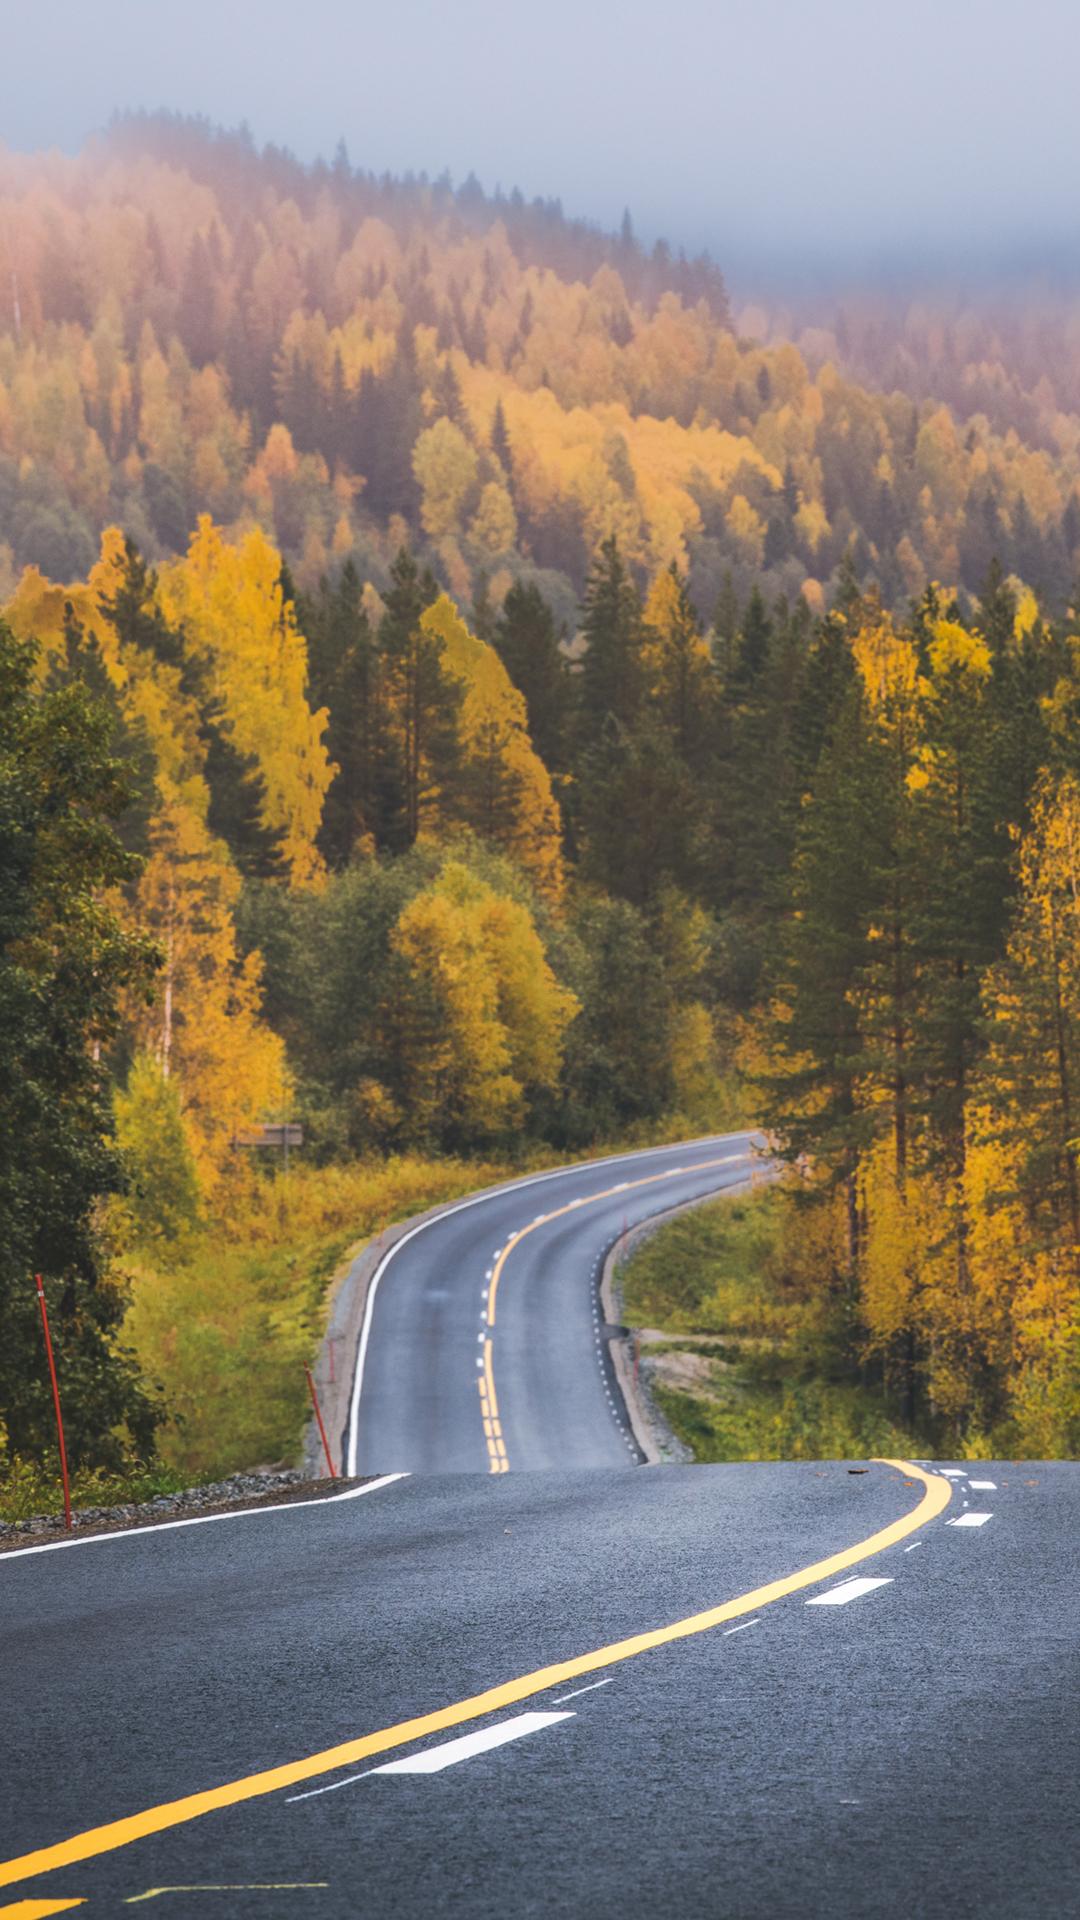 Wallpaper : alam, pemandangan, tampilan potret, hutan, jalan